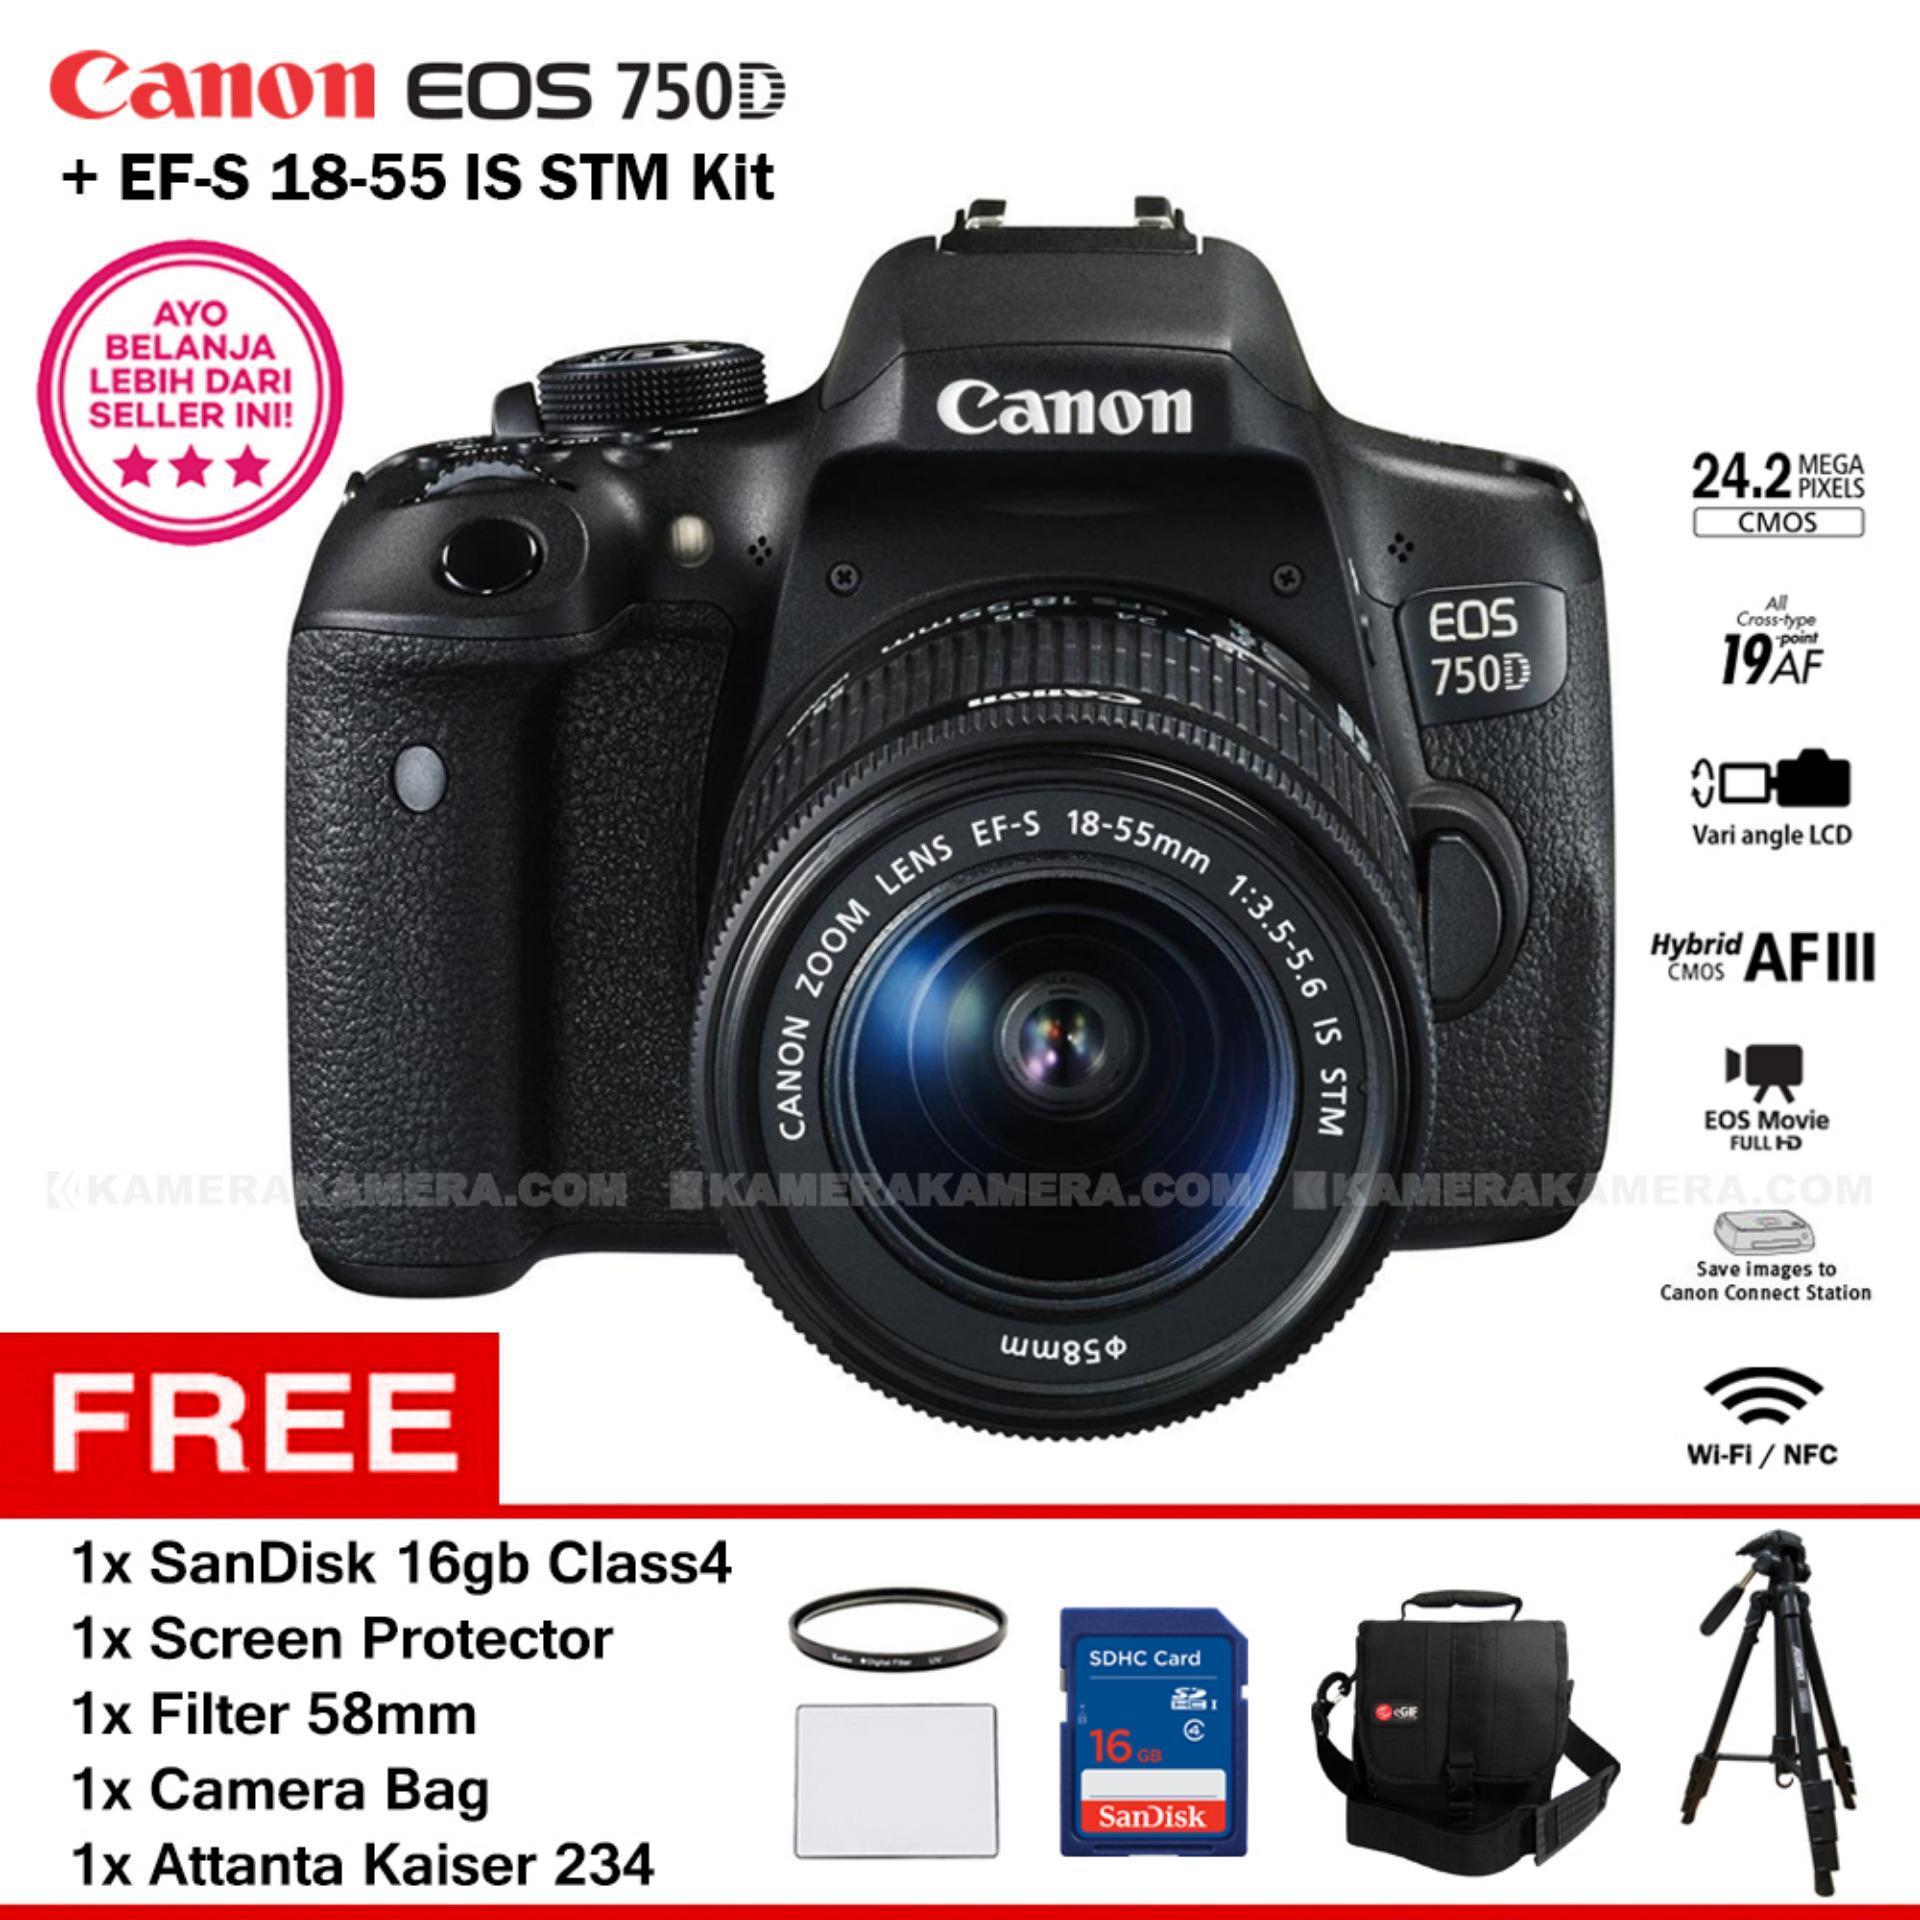 Cek Harga Baru Canon Powershot Sx430 Is Wifi 20mp 45x Optical Zoom Sony Dsc H300 201 Mp 35x Free Sdhc 16gb Eos 1300d Ef S 18 55mm Iii 18mp Garansi 1th Screen